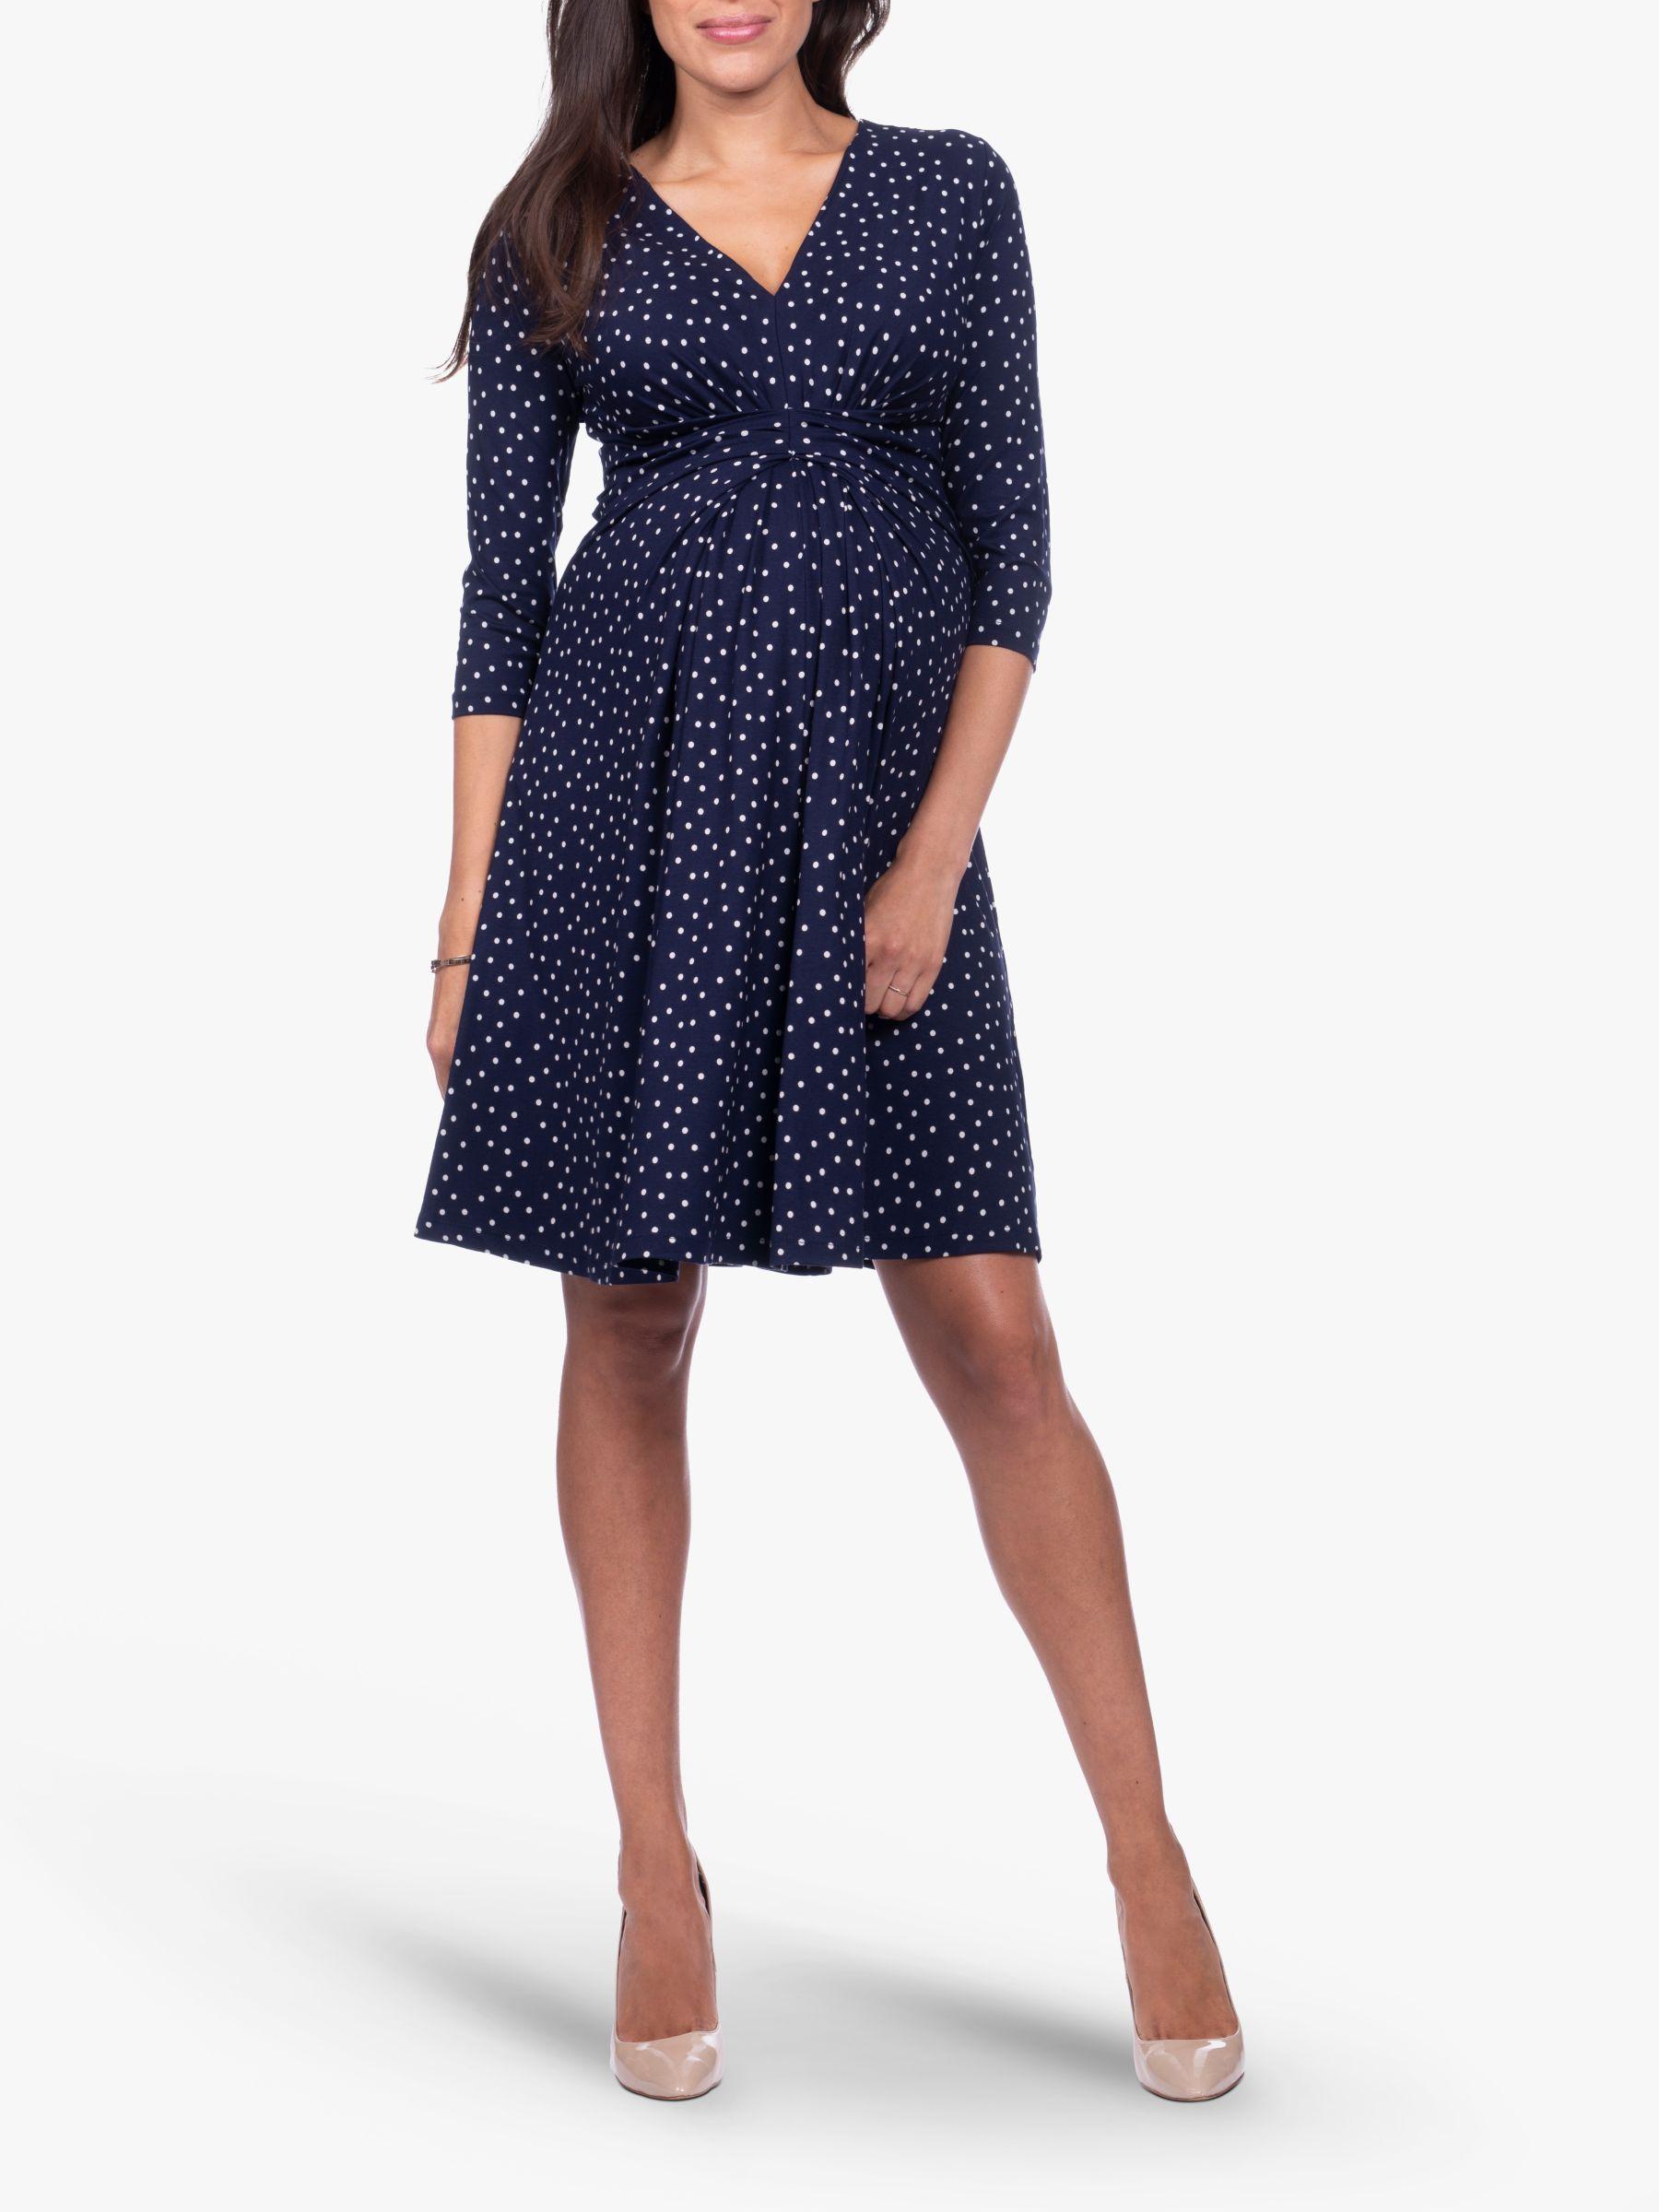 Séraphine Séraphine Eva 3/4 Sleeve Maternity Dress, Navy